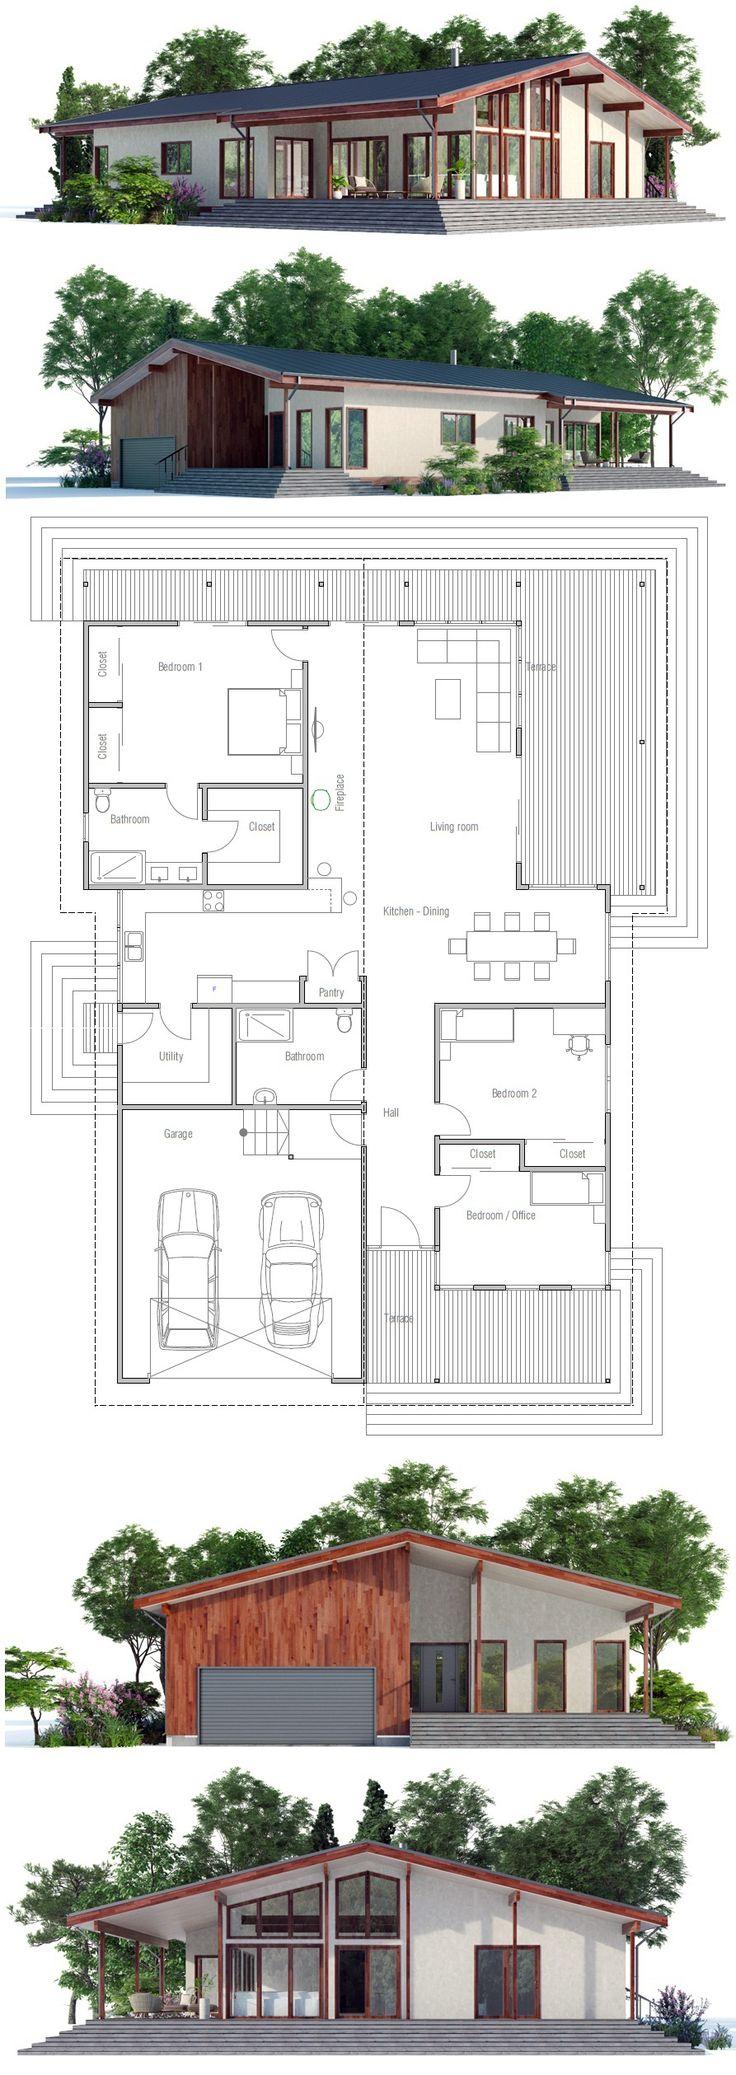 Häuser, Haus                                                                                                                                                                                 More